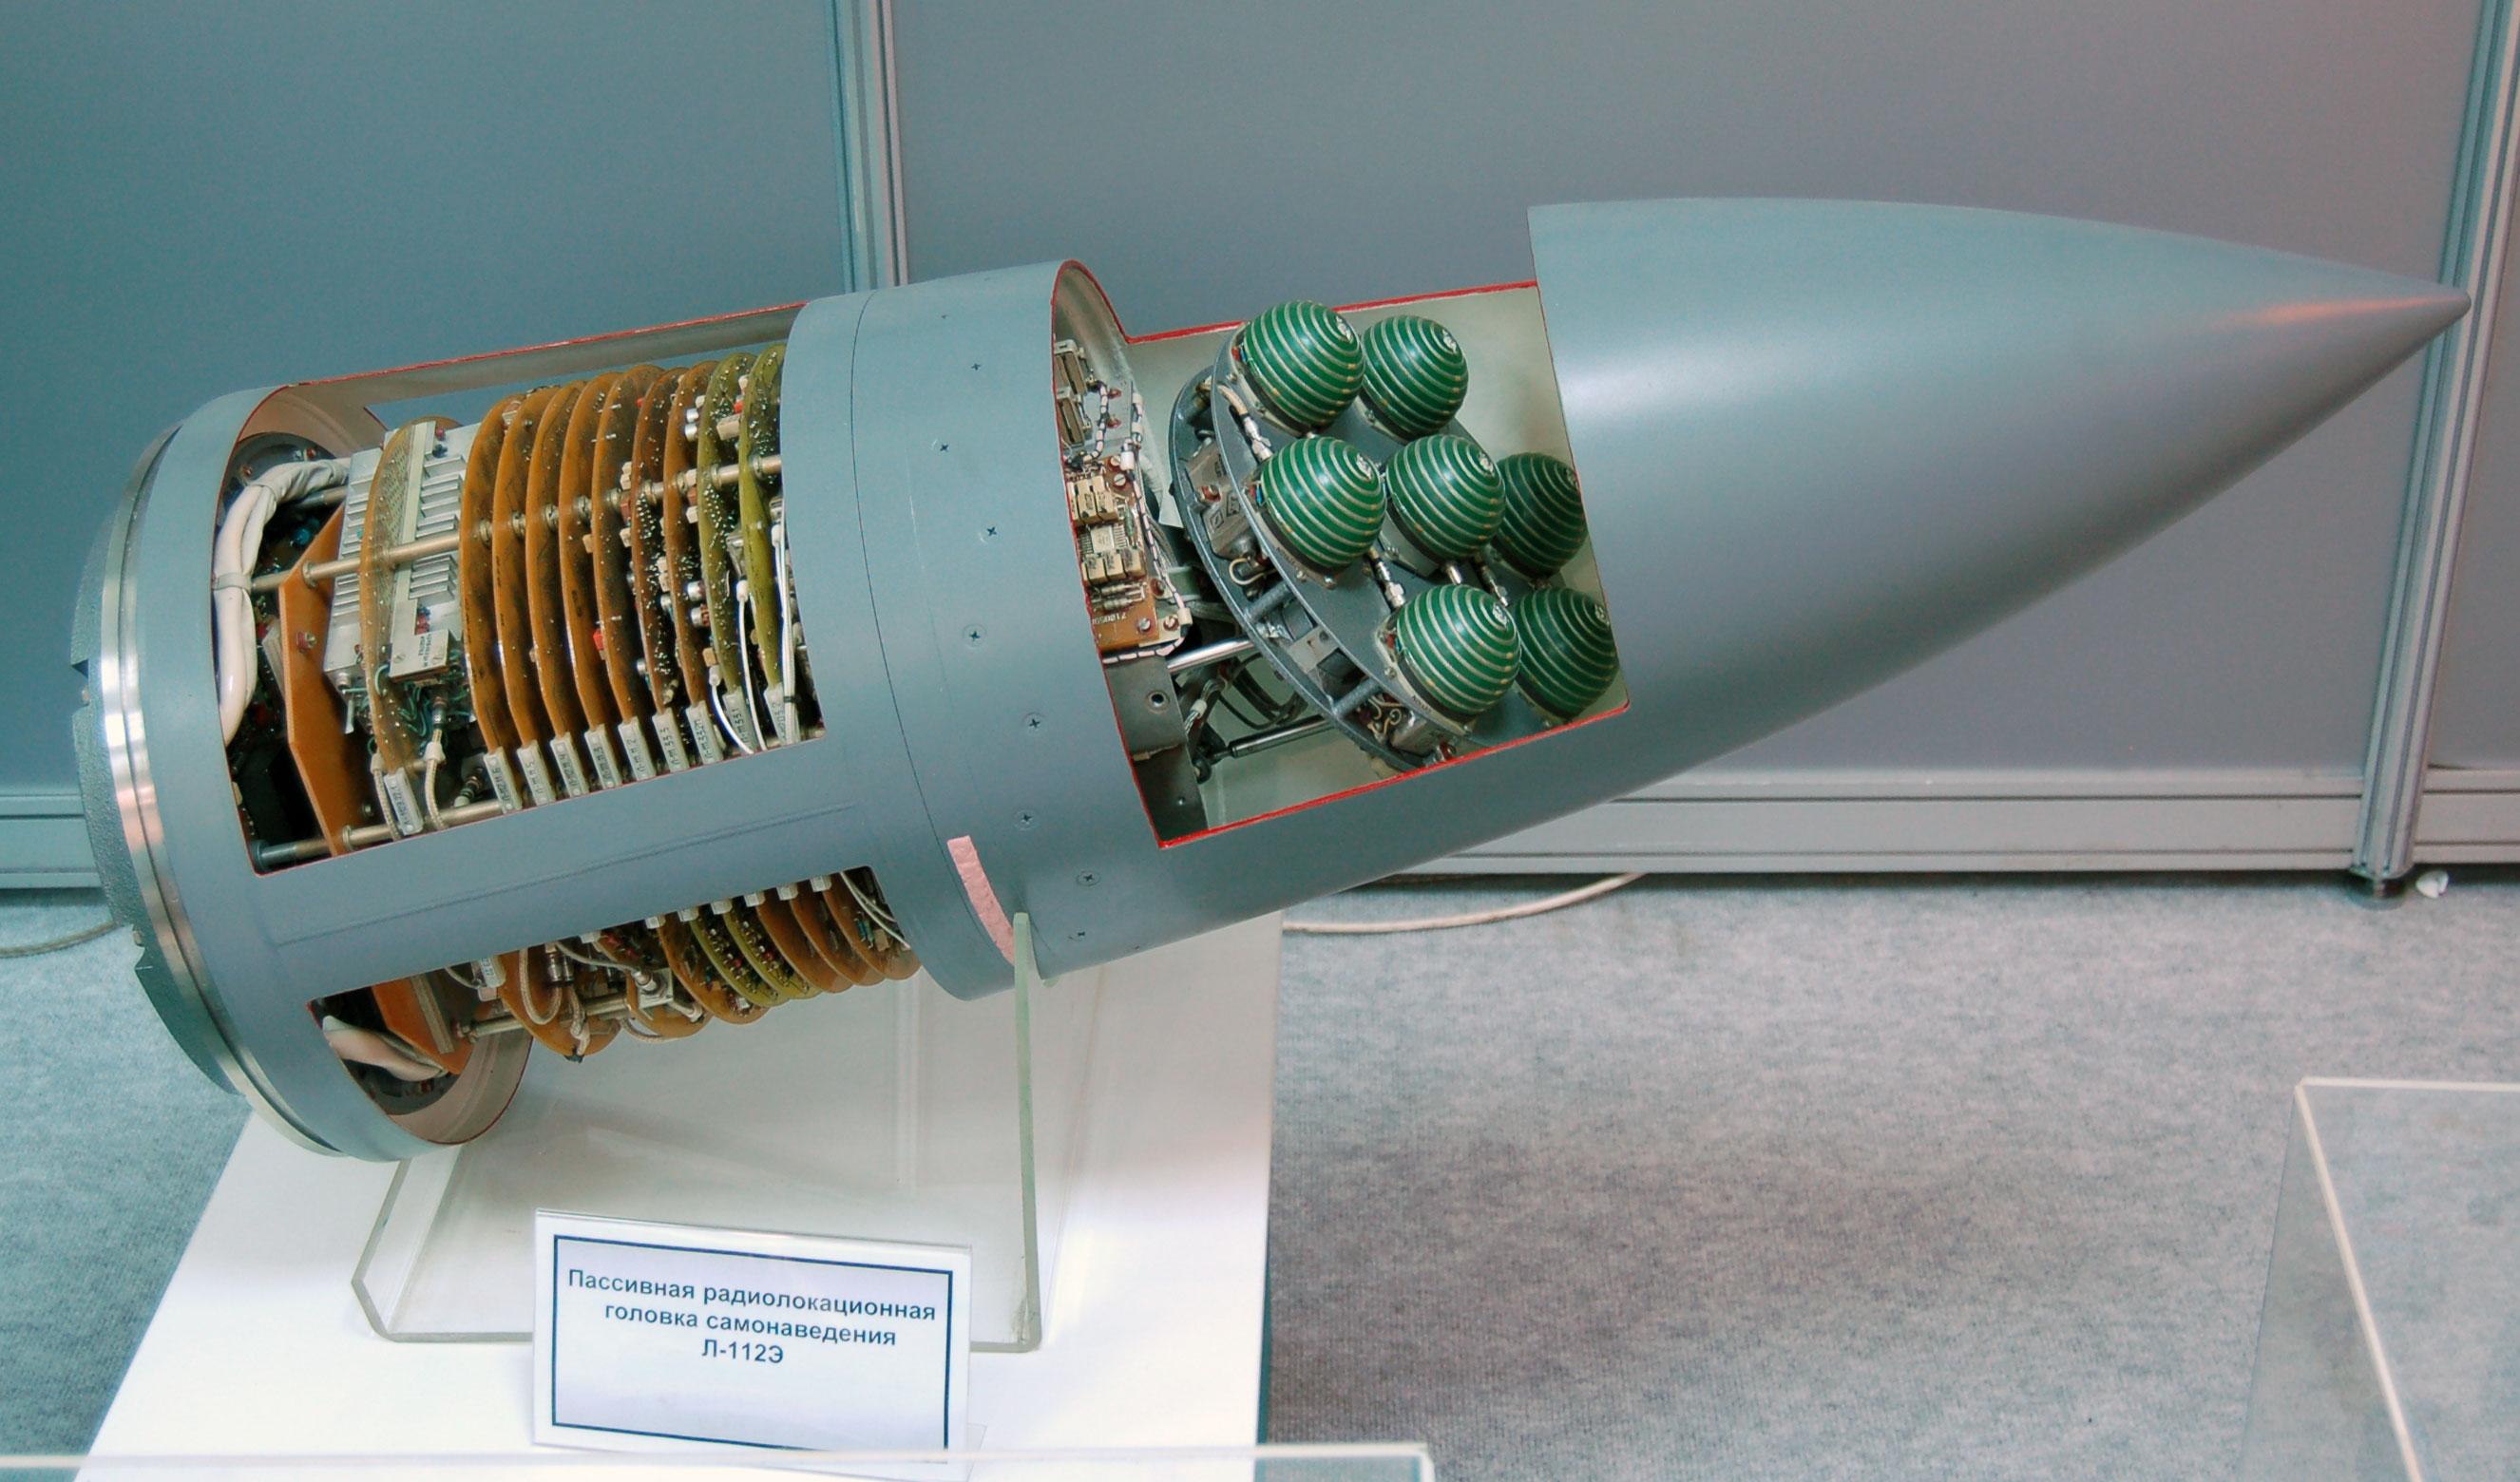 Guía Avtomatika L-112E para el misil anti-radiación ruso Kh-31P (MAKS 2009).